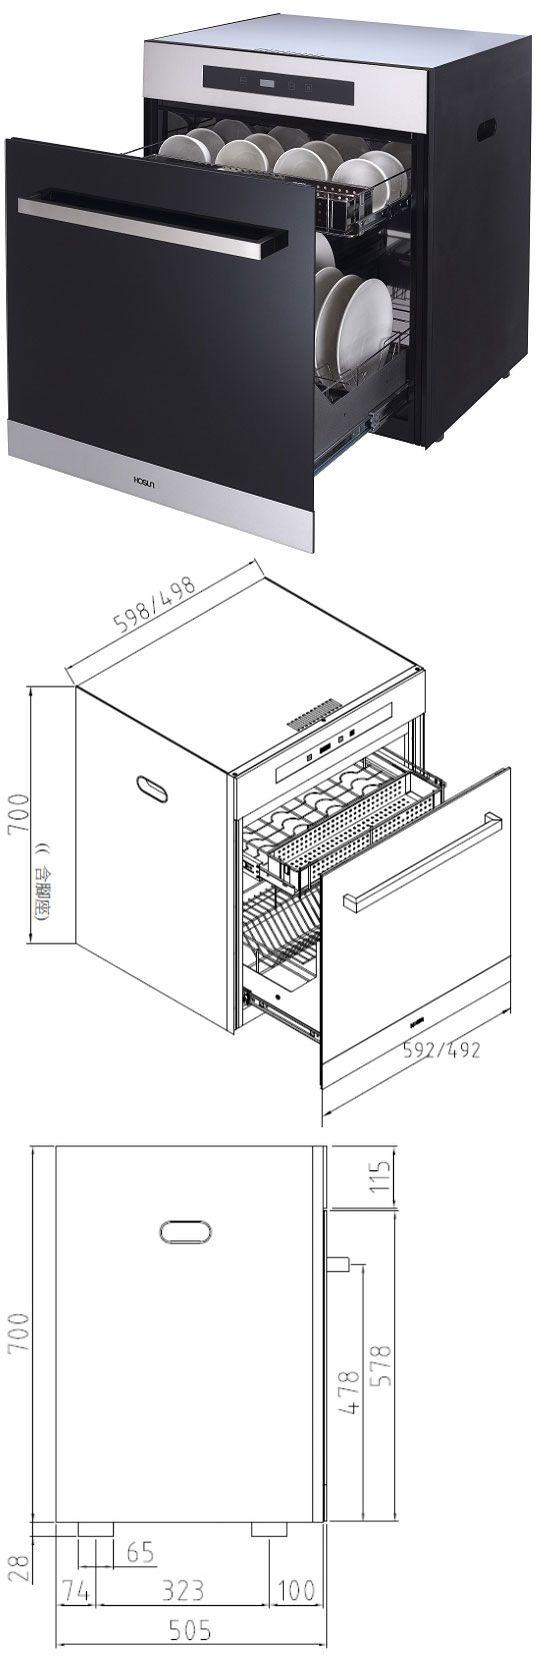 PK/goods/HOSUN/Dish%20Dryer/FD-5215(6215)-1.jpg